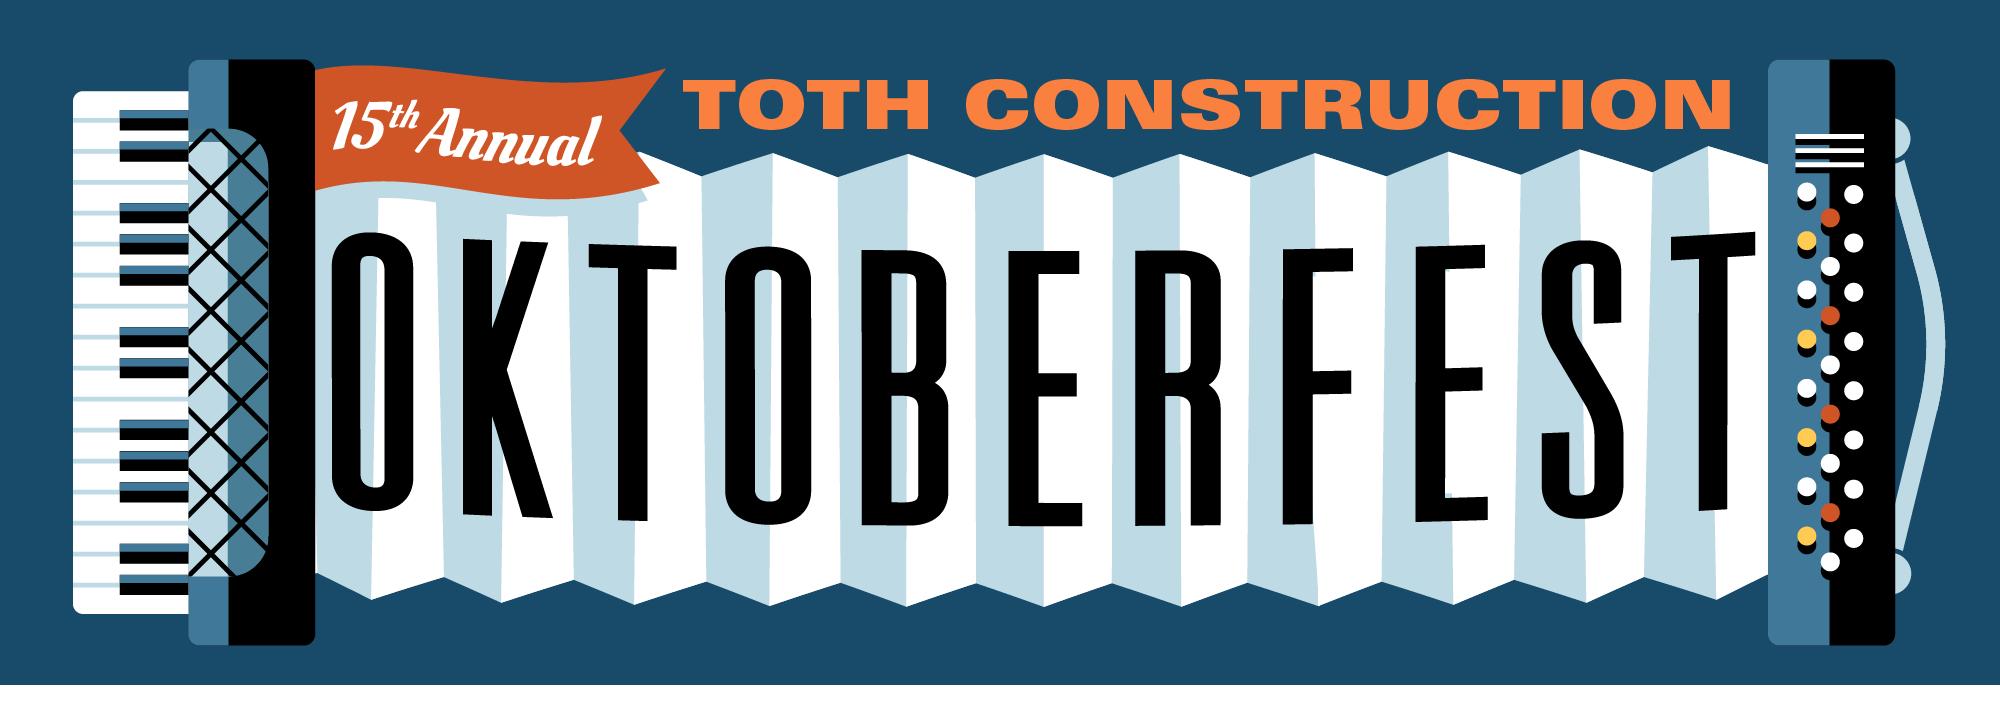 oktoberfest-website-graphic.png